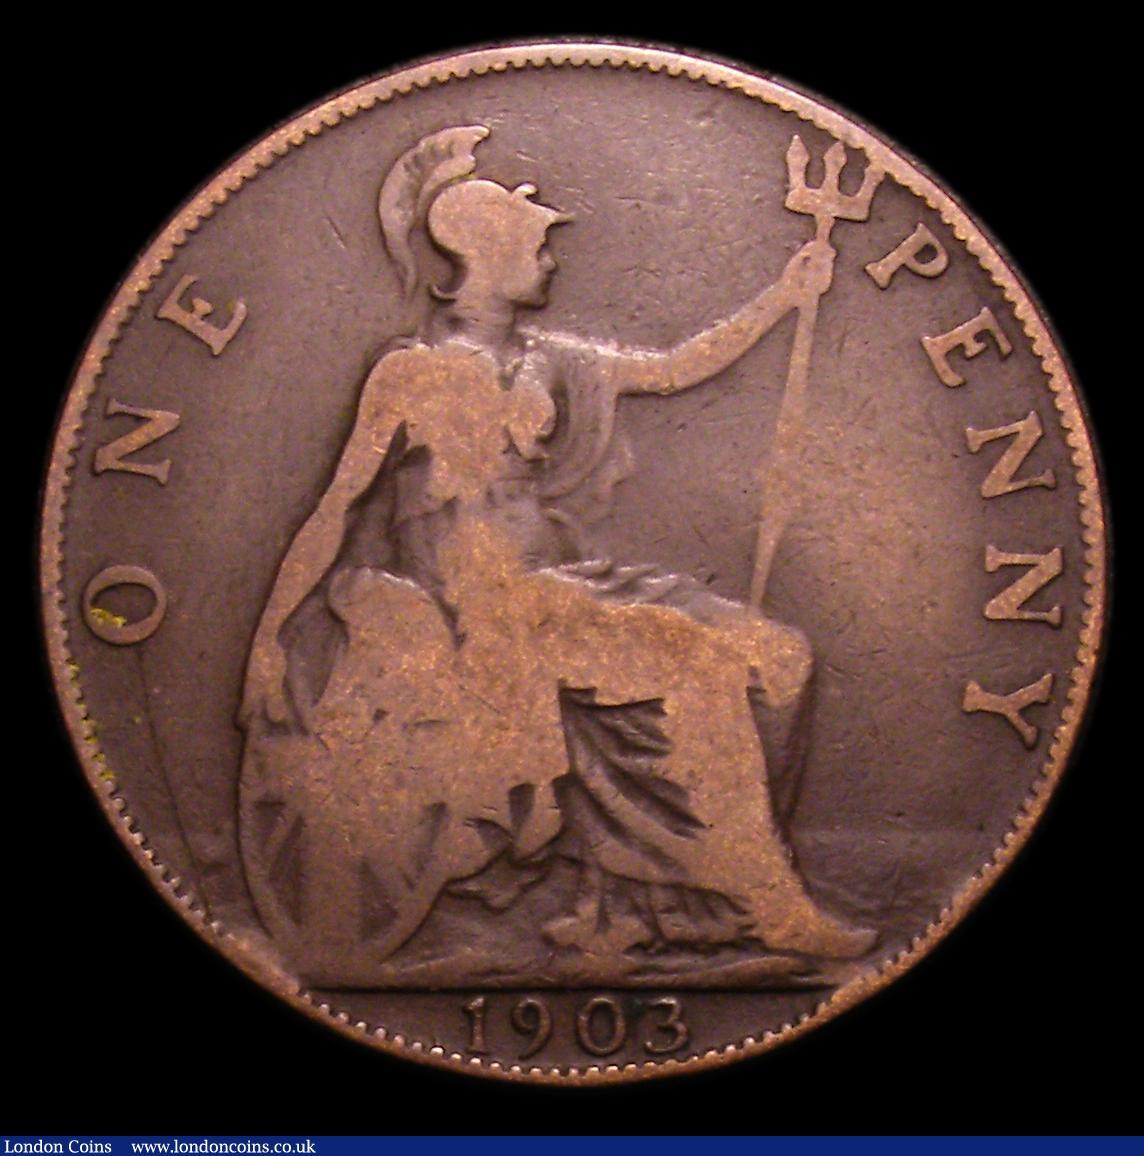 Penny 1903 Open 3 Freeman 158A dies 1+B VG Rare, Ex-John of